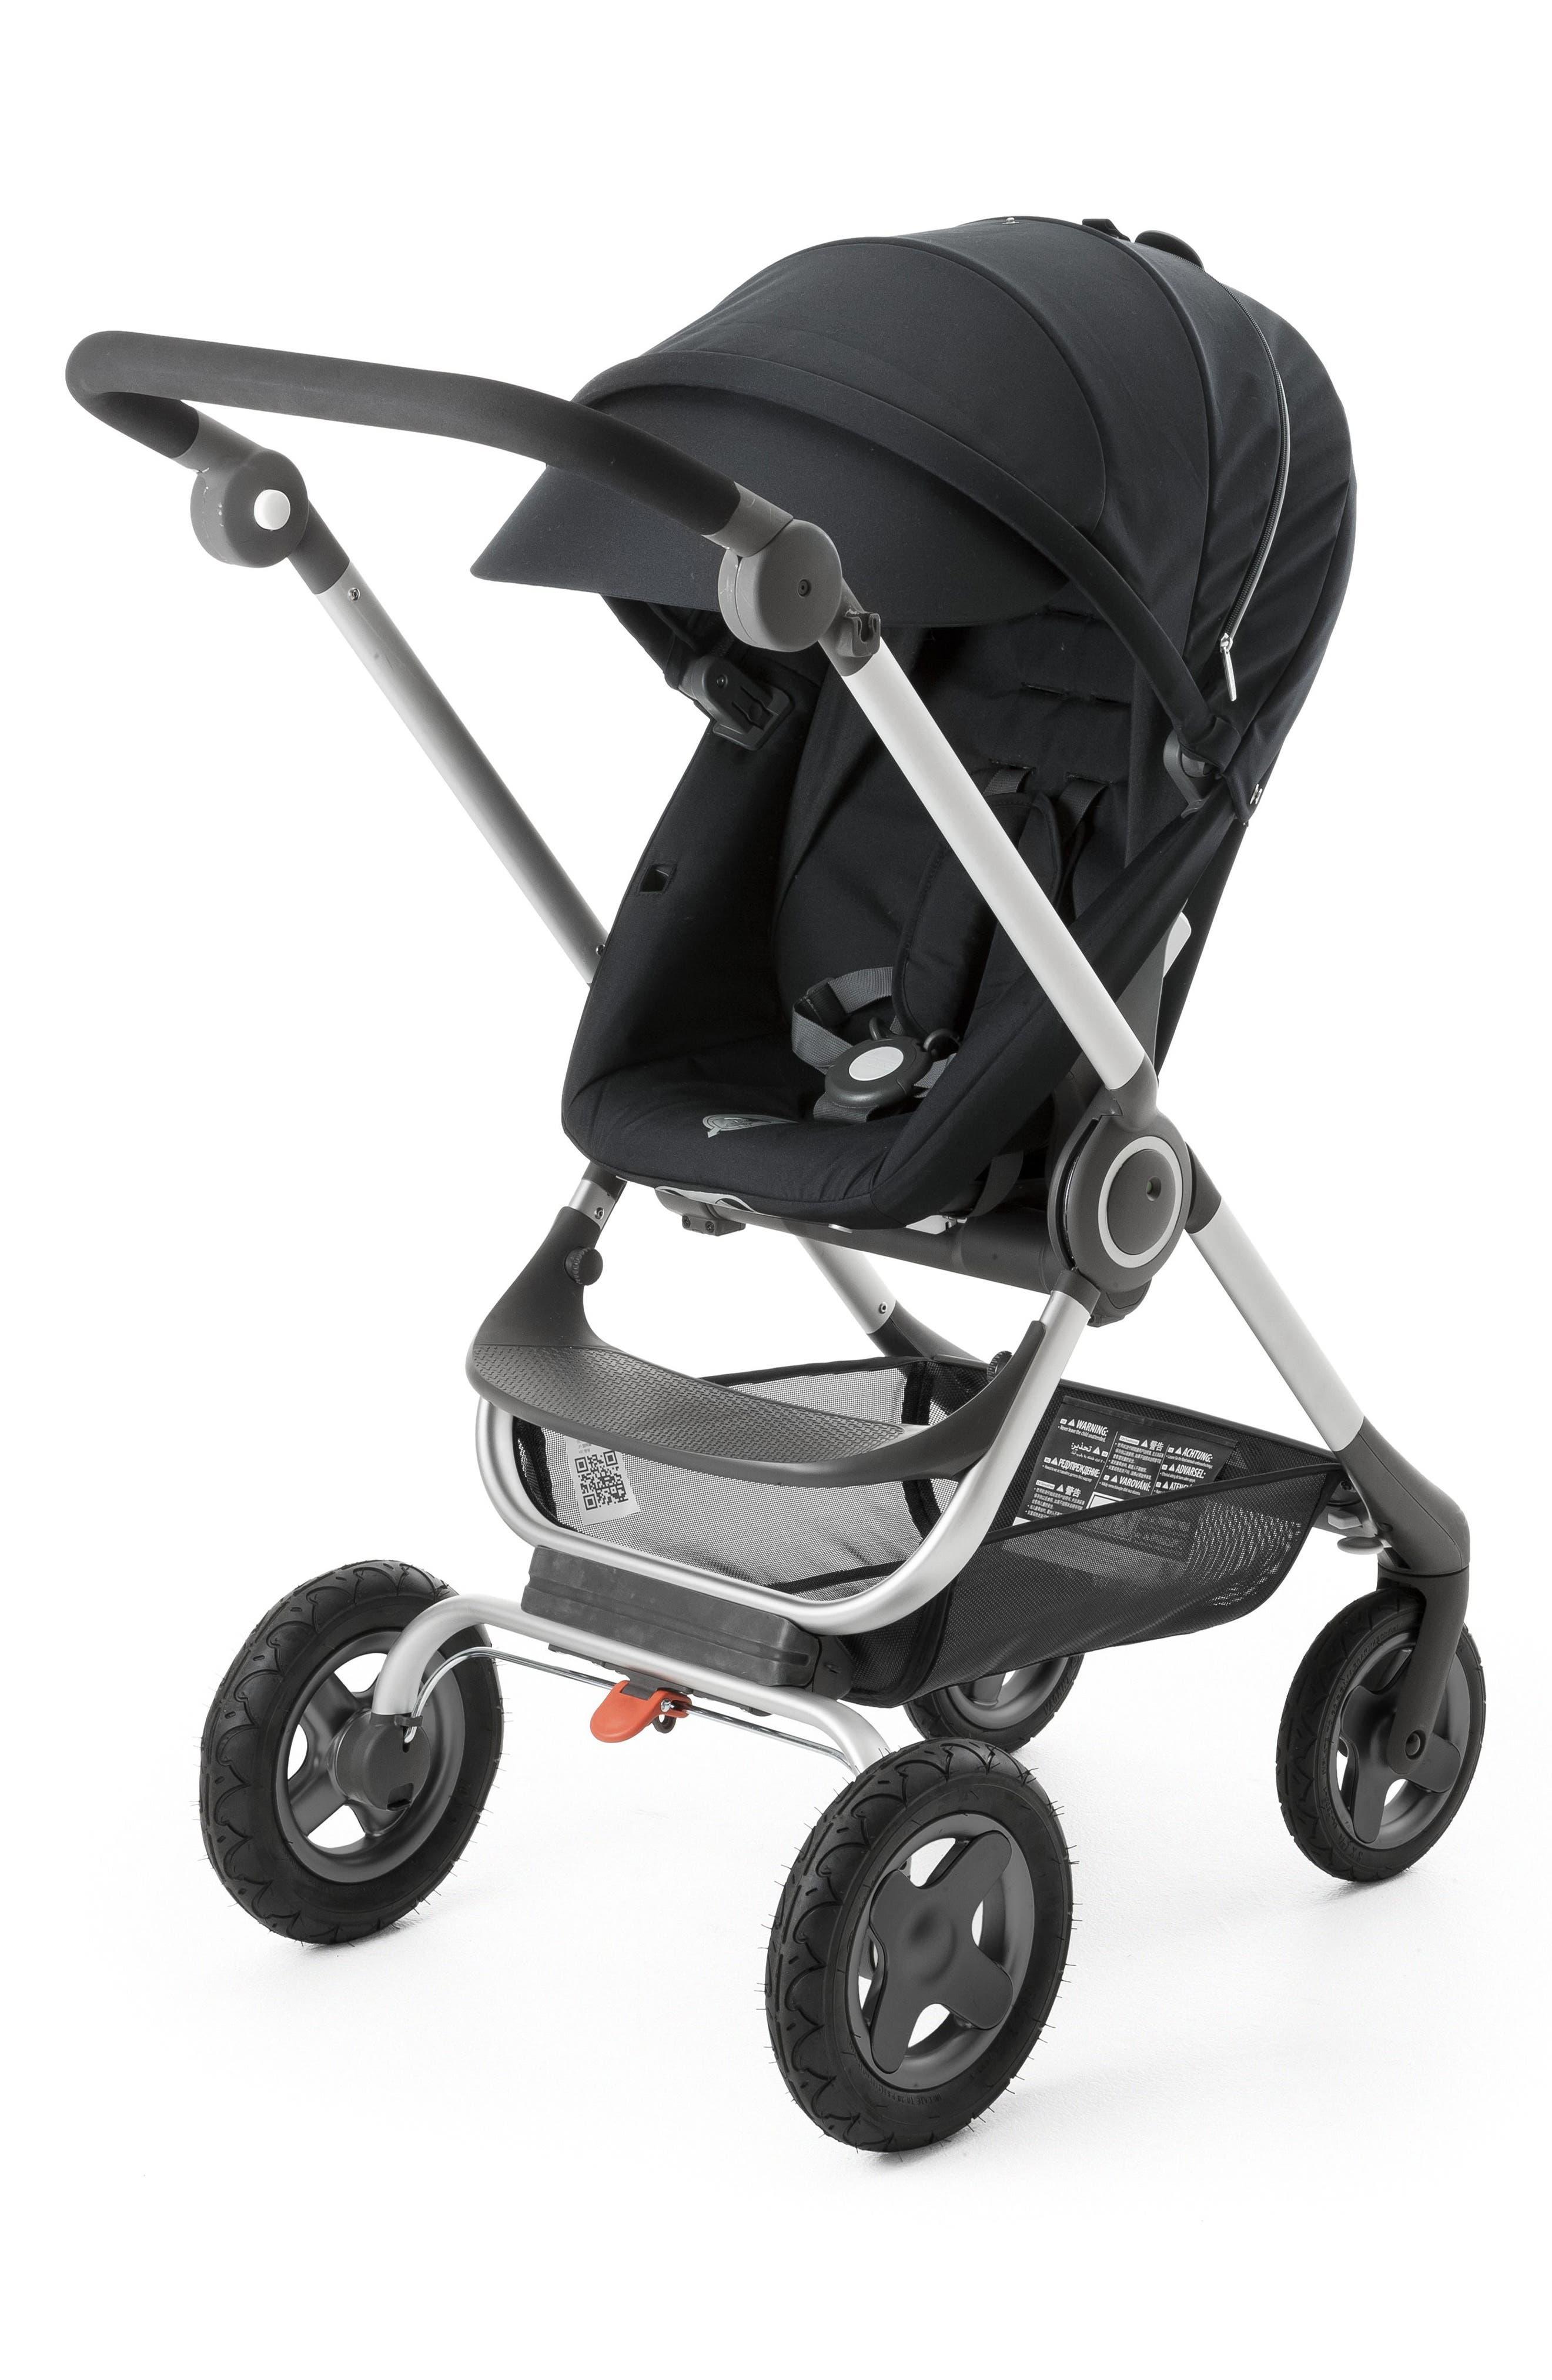 Main Image - Stokke® Scoot™ Complete Stroller